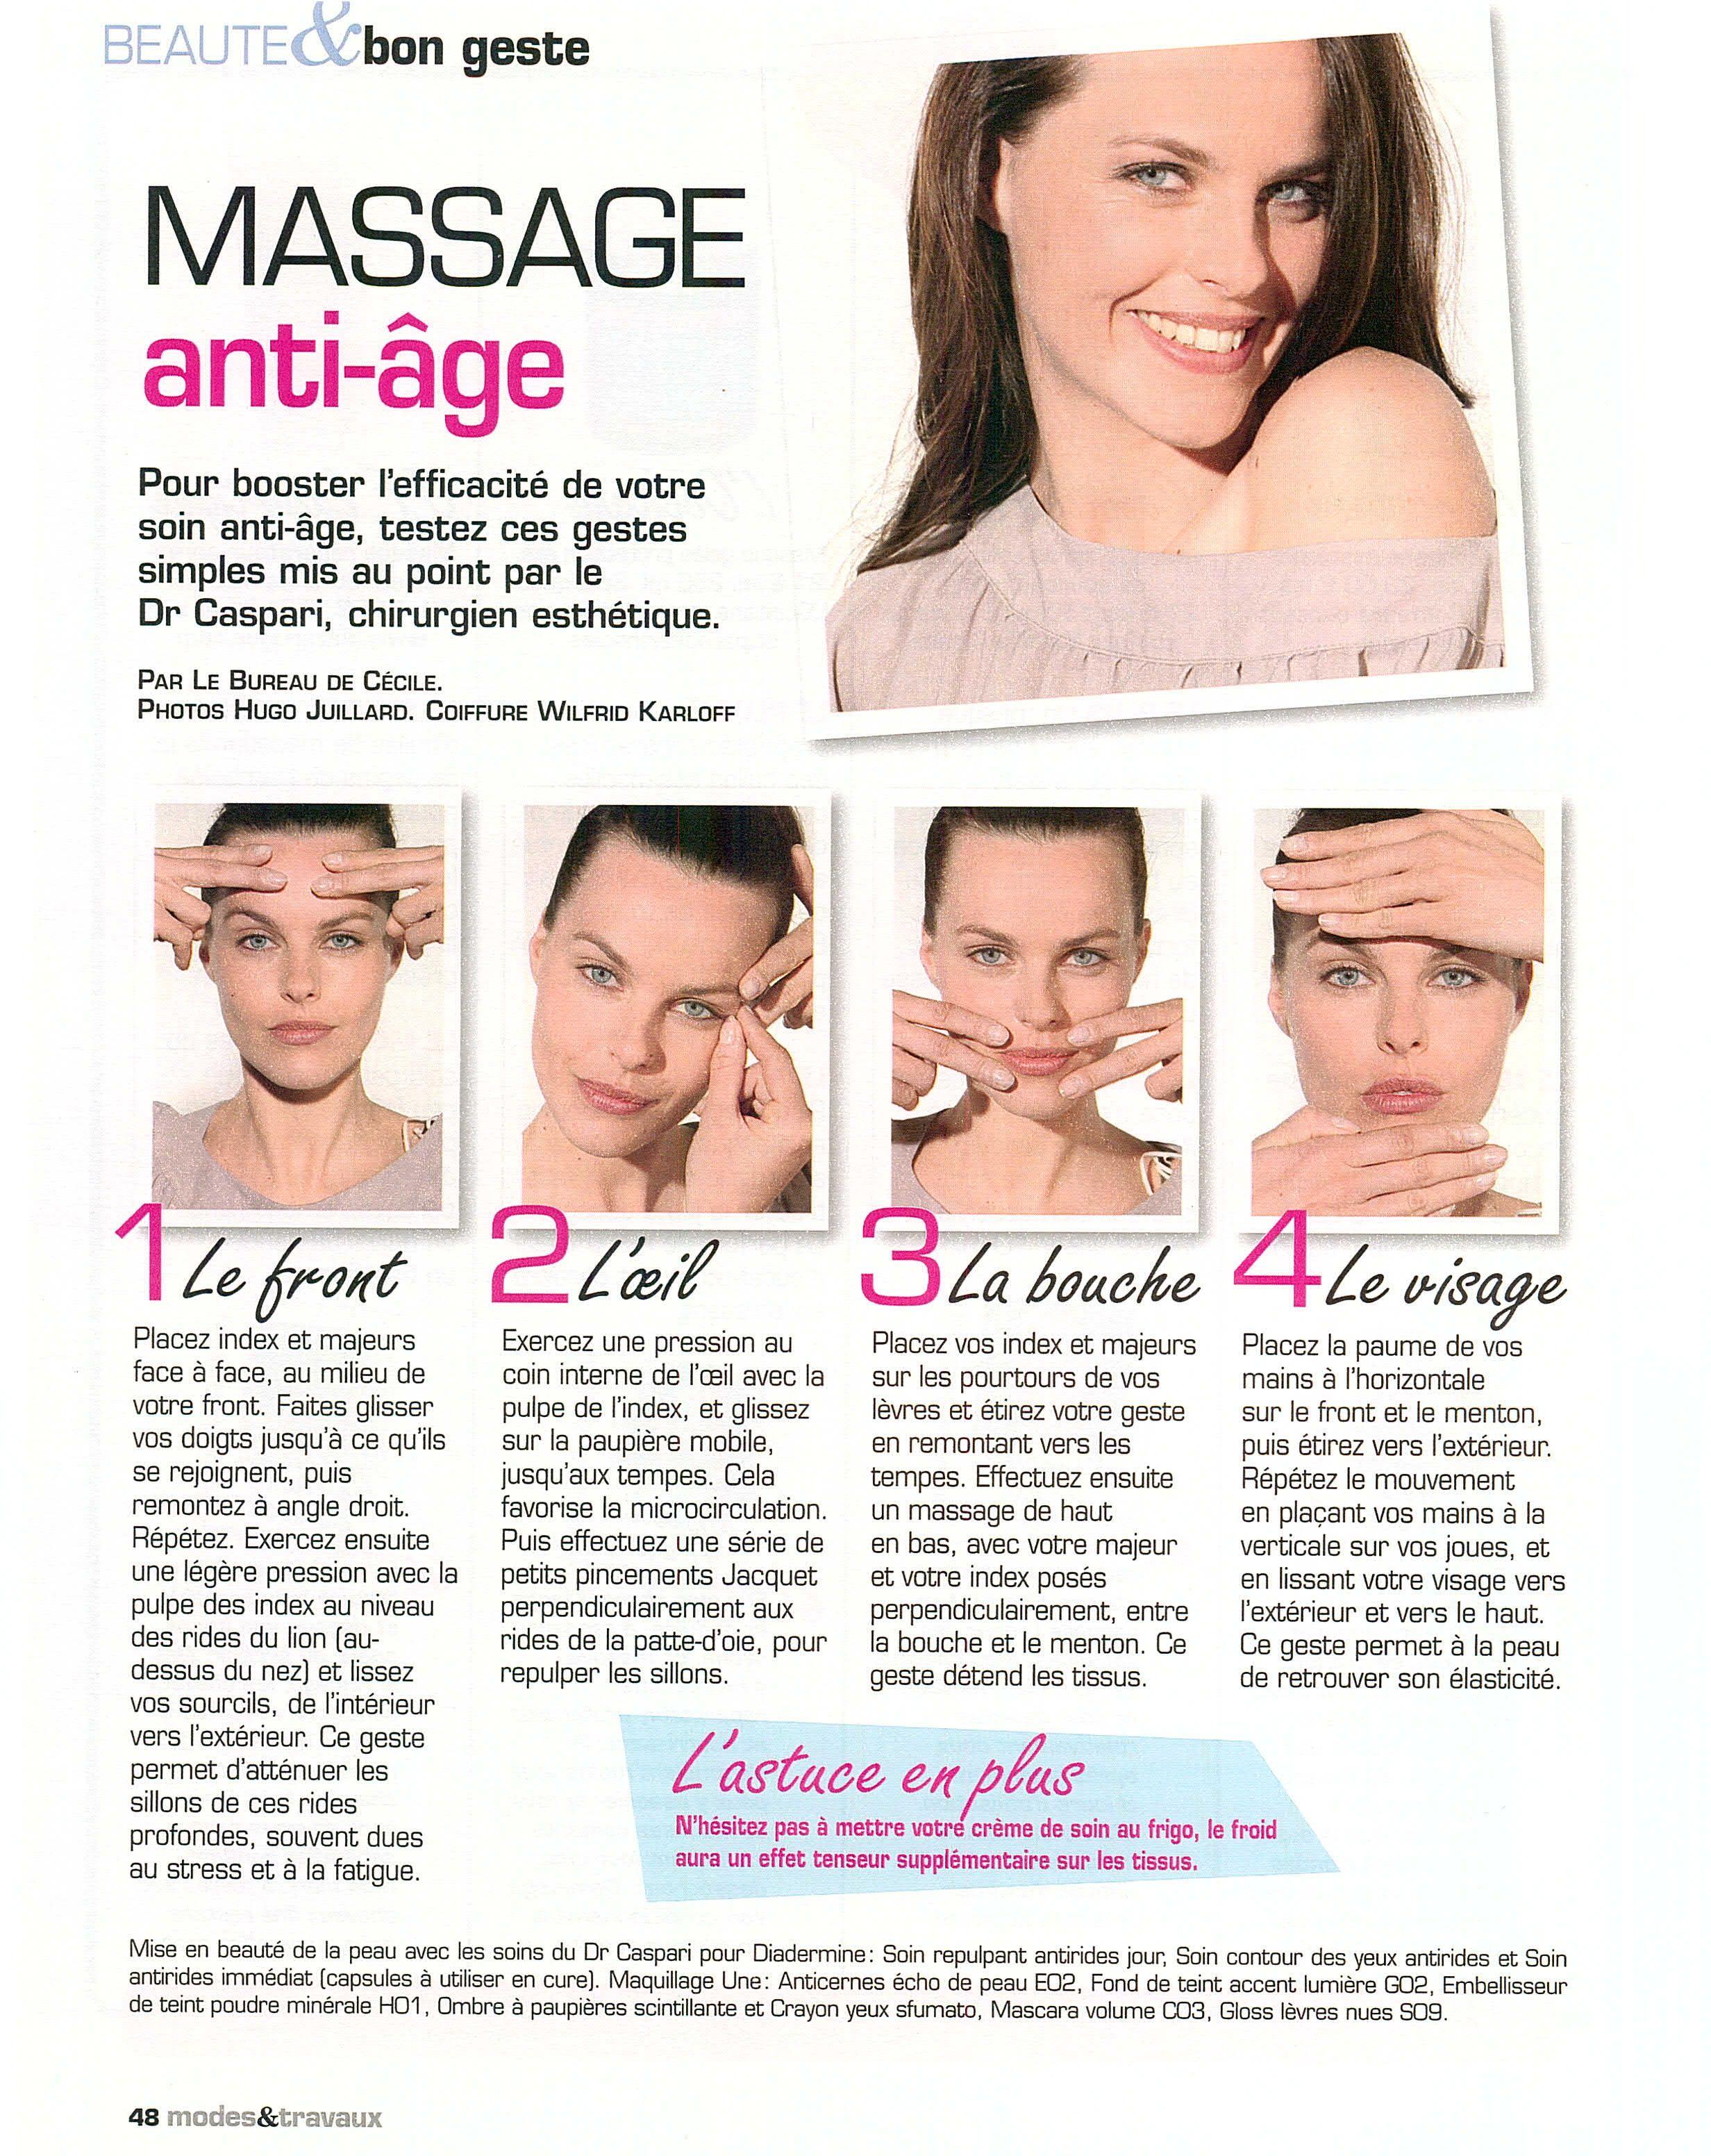 massage visage anti ge entretien du corps pinterest massage visage bien tre et sant beaut. Black Bedroom Furniture Sets. Home Design Ideas